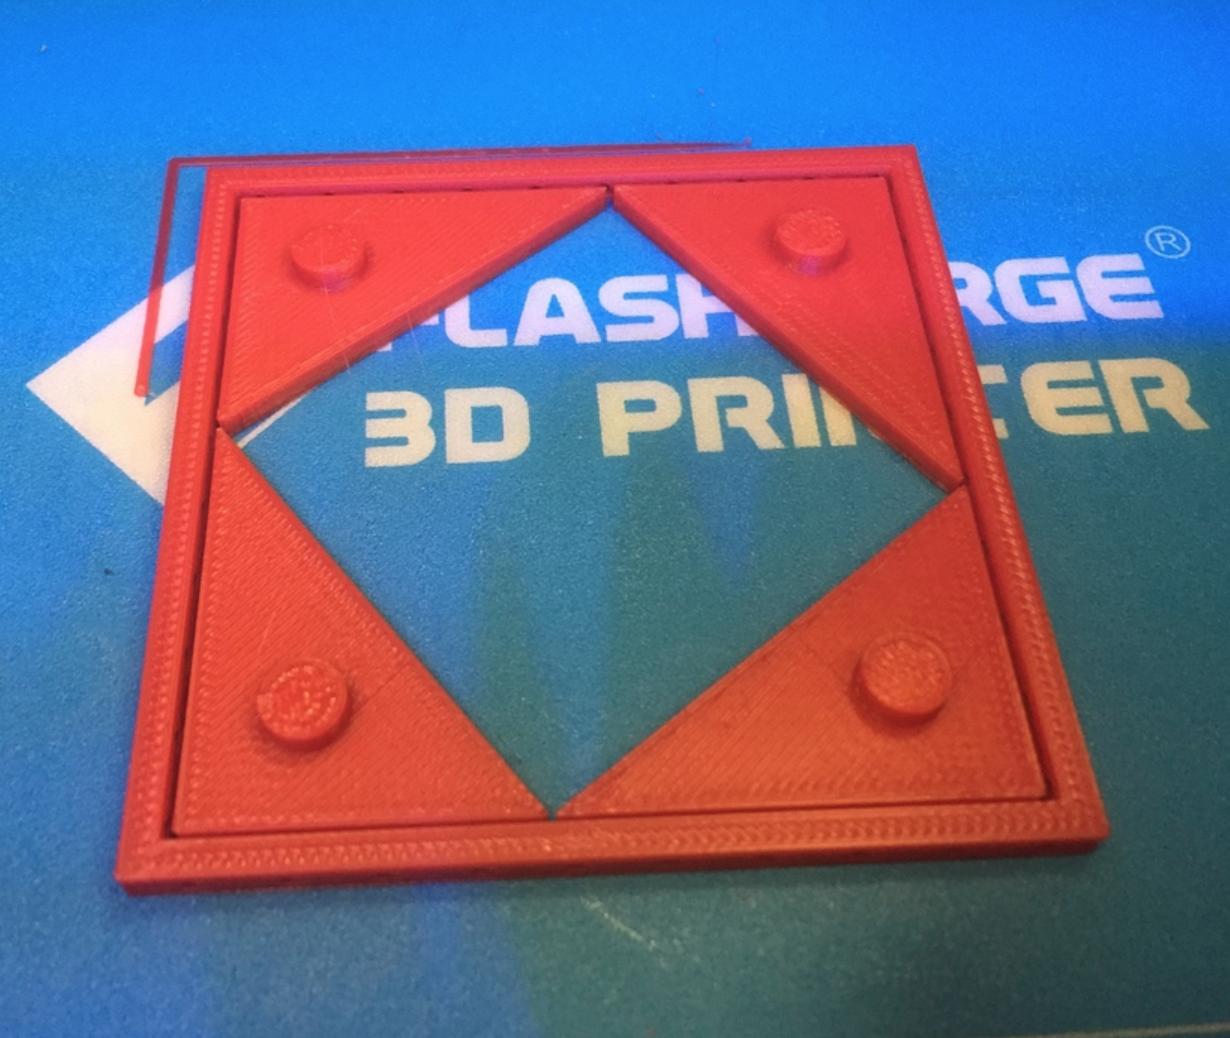 Capture d'écran 2017-12-26 à 15.09.12.png Download free STL file Pythagorean Theorem, Visual Proof, Chinese Origin • 3D printer template, LGBU